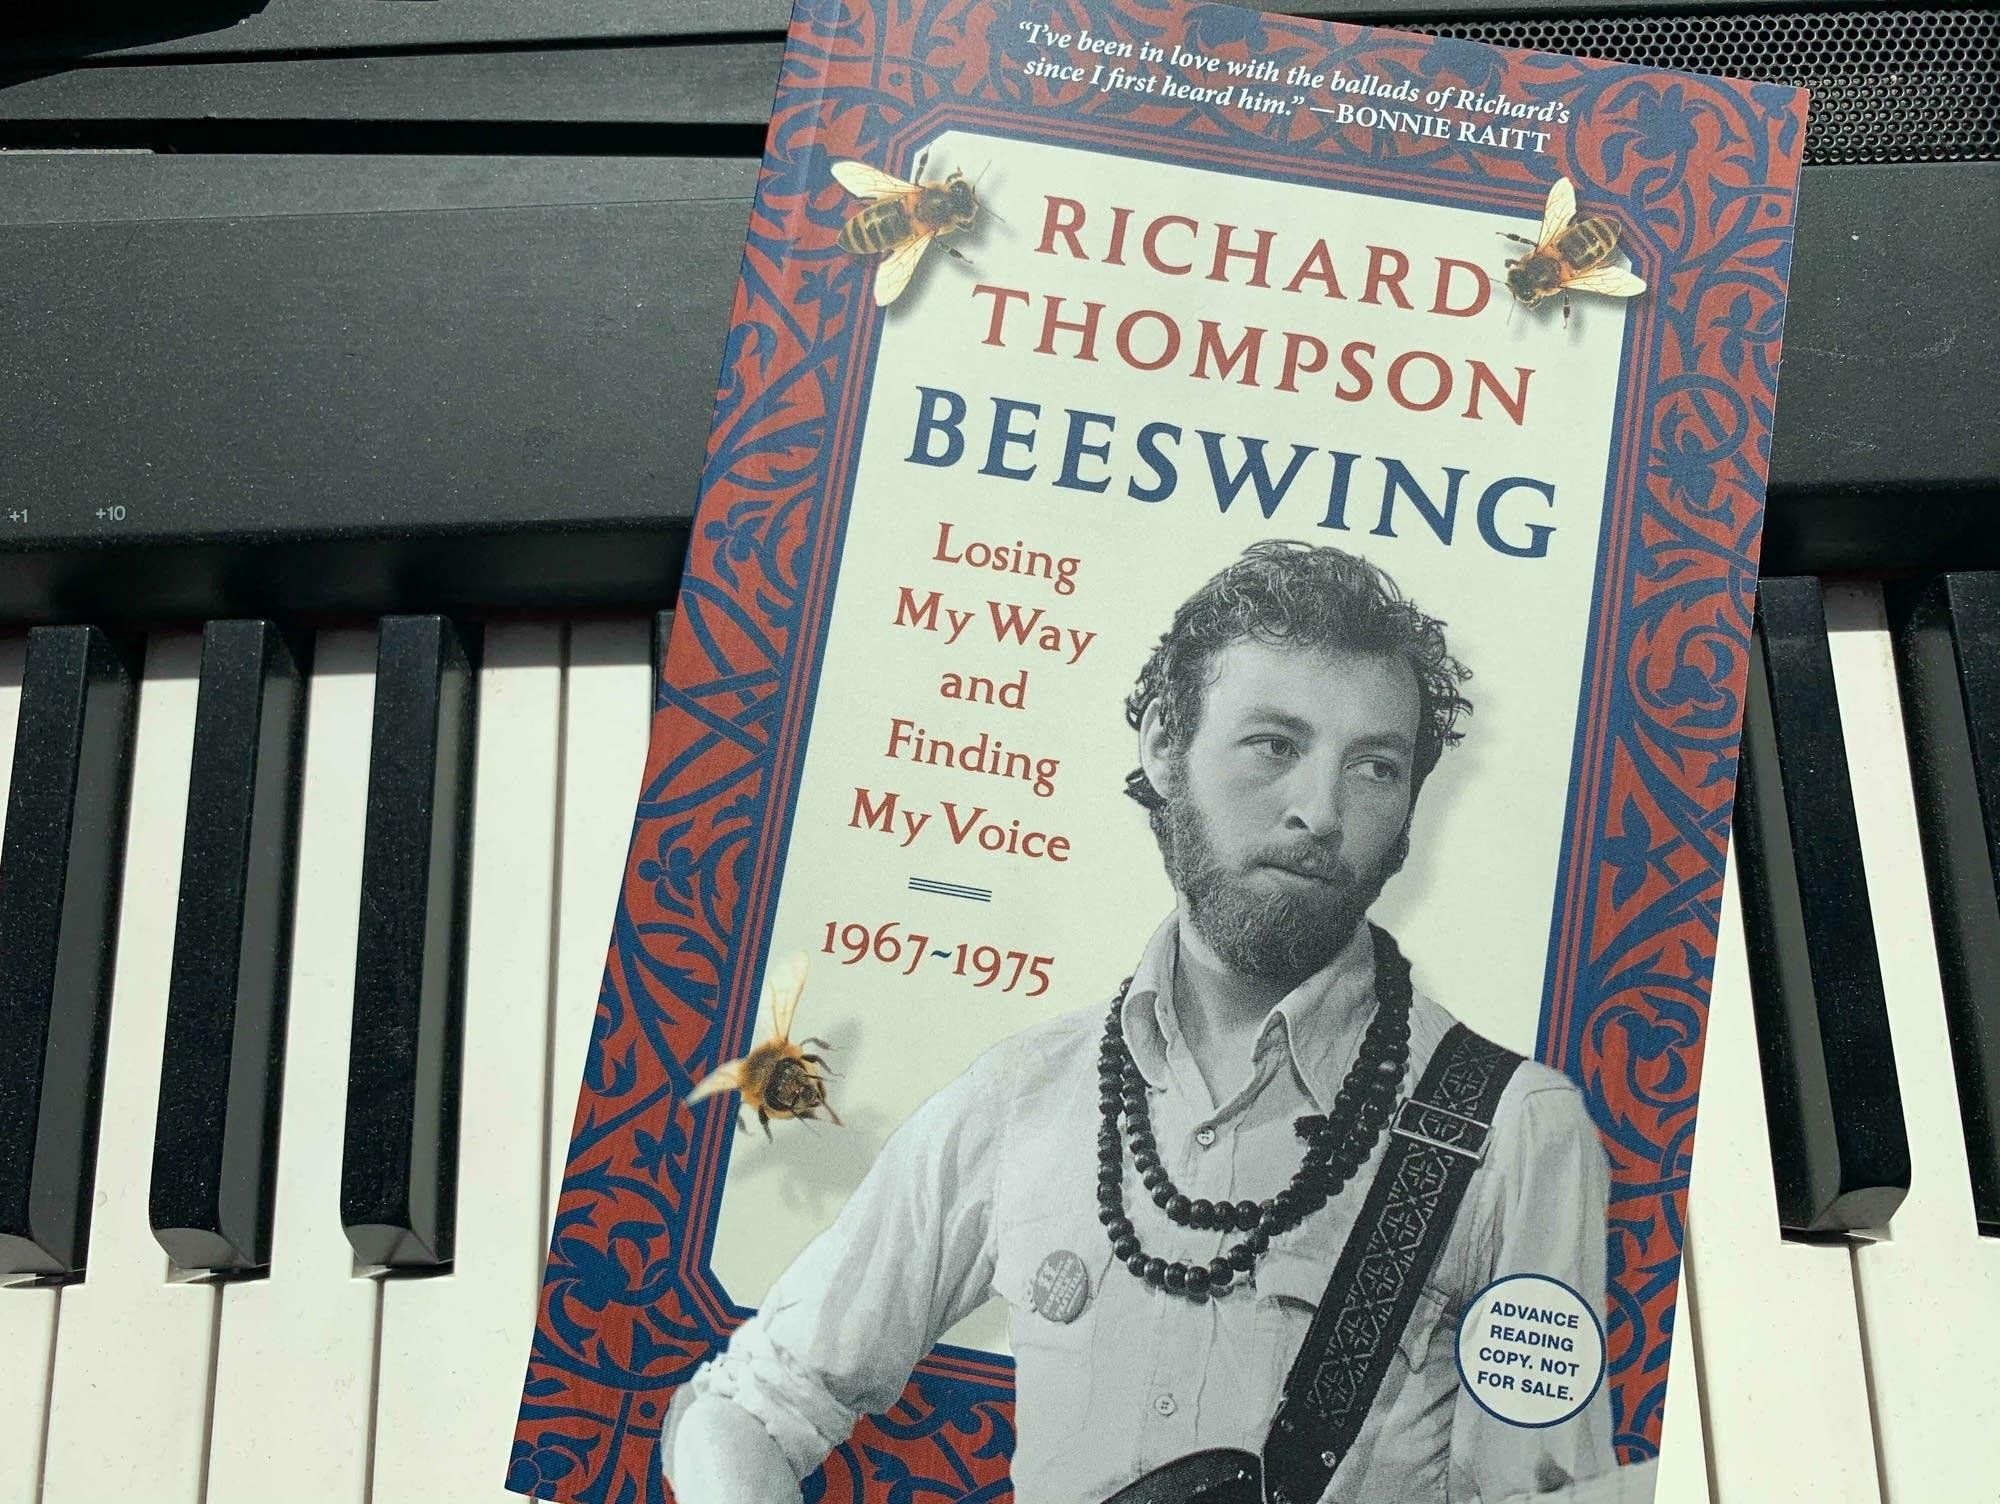 Richard Thompson's book 'Beeswing.'